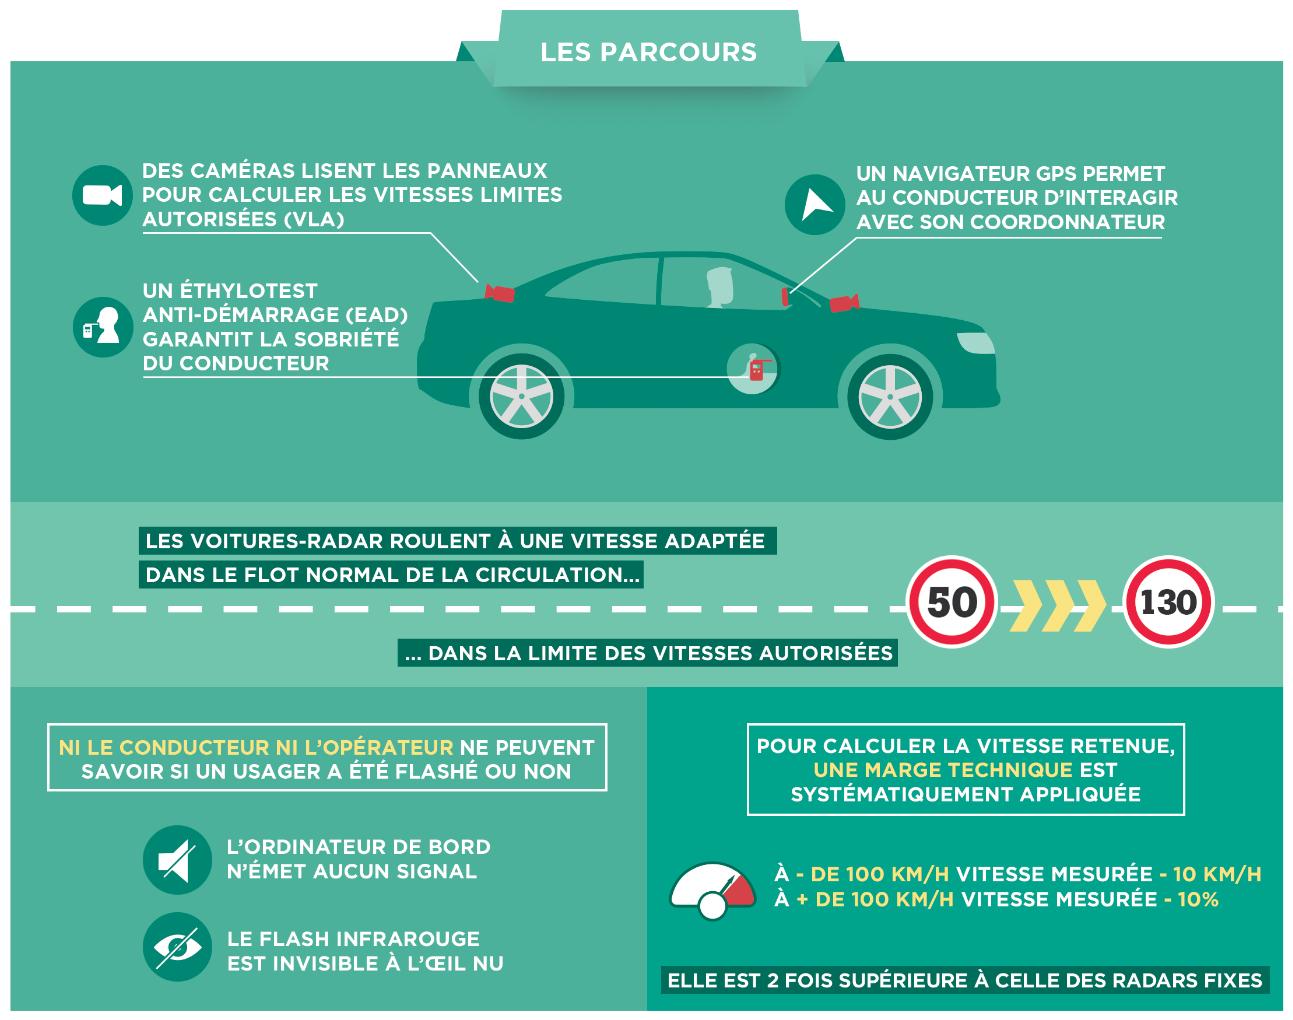 voitures-radars parcours